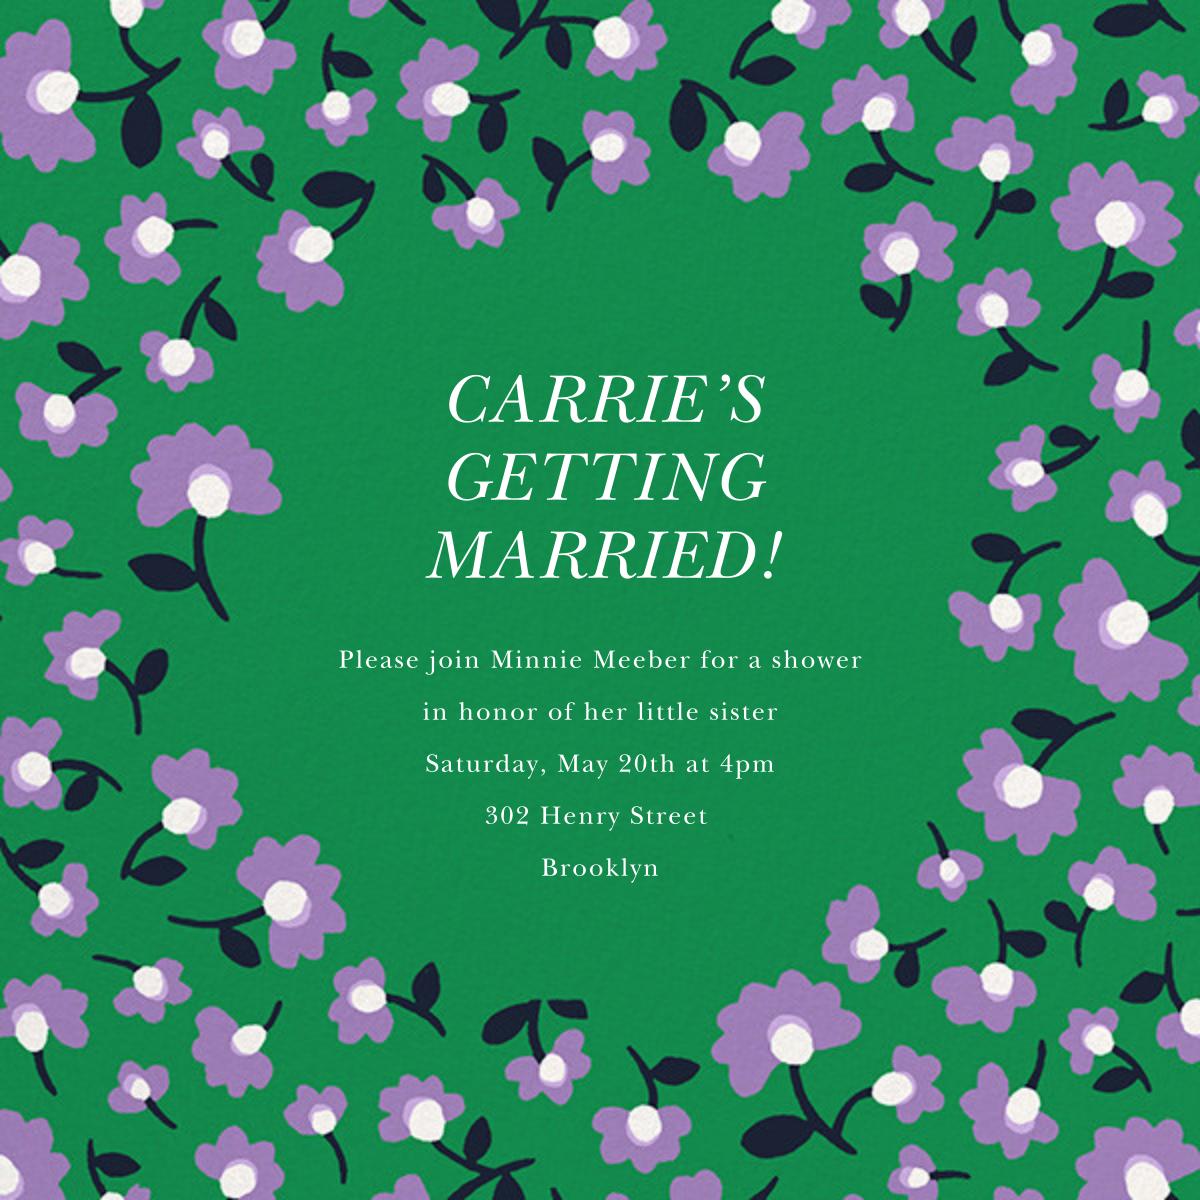 Mini Flowers - Emerald - kate spade new york - Bridal shower